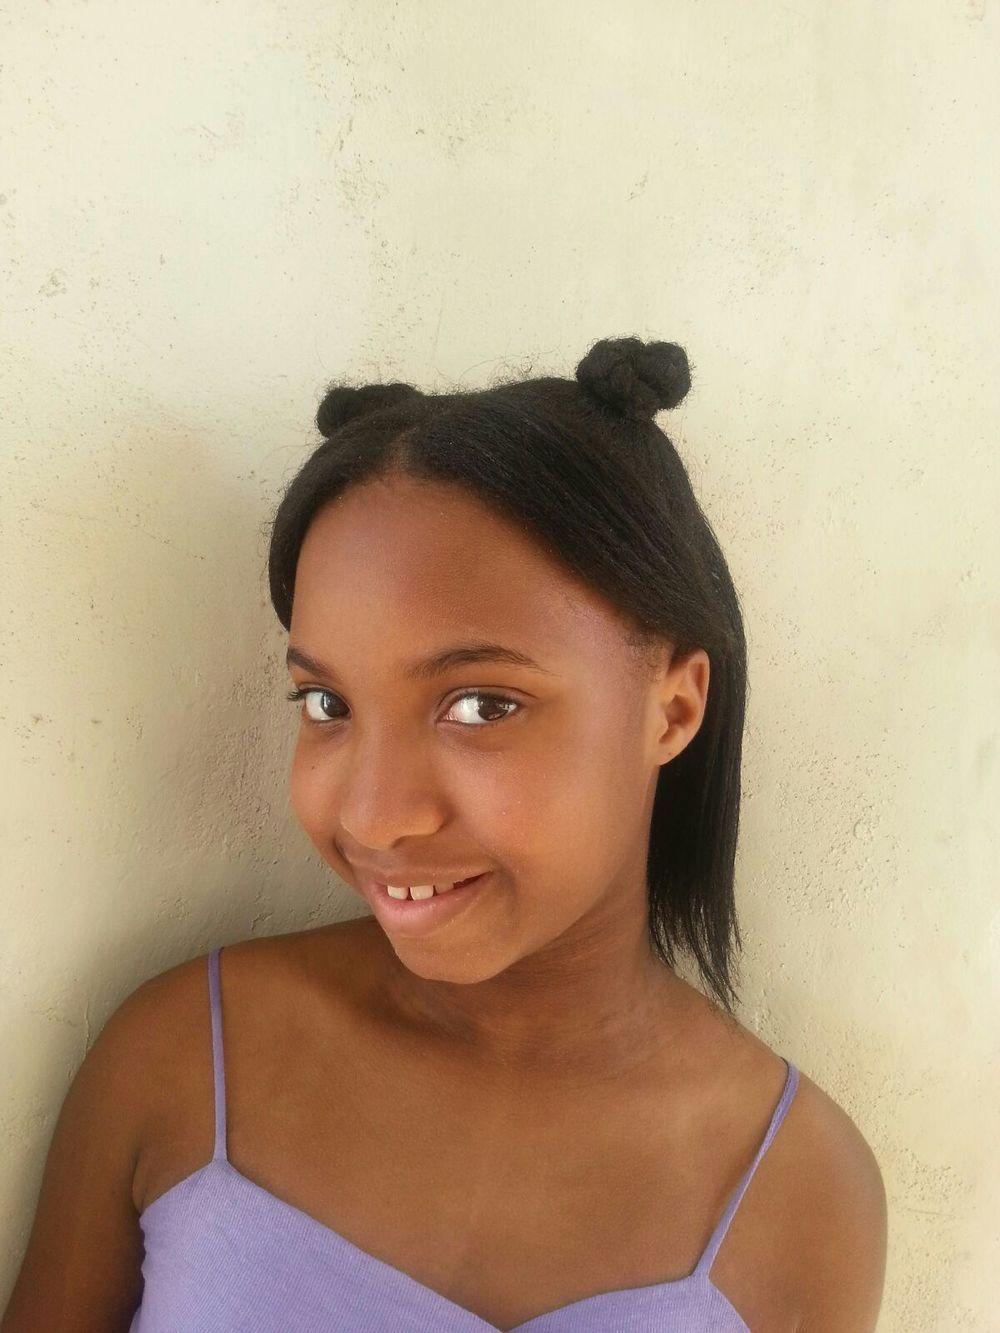 Iyahana Baltimore | Artist & Fashion Designer, The Step Up Sister